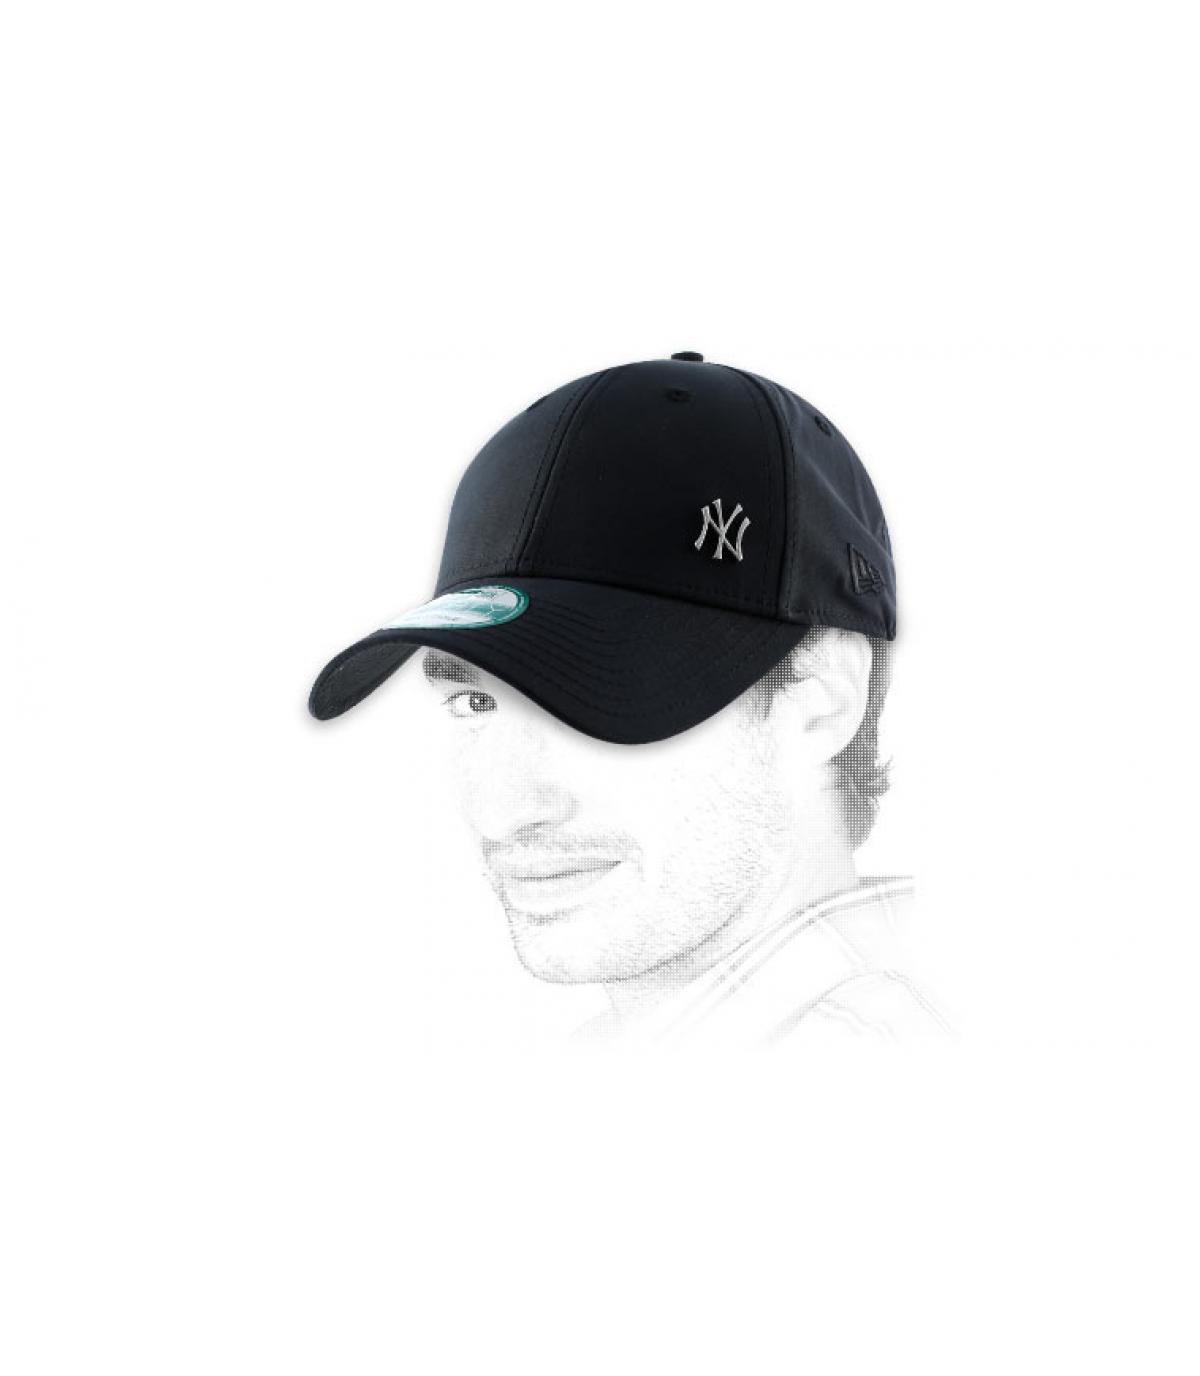 NY casquillo negro pequeño logotipo